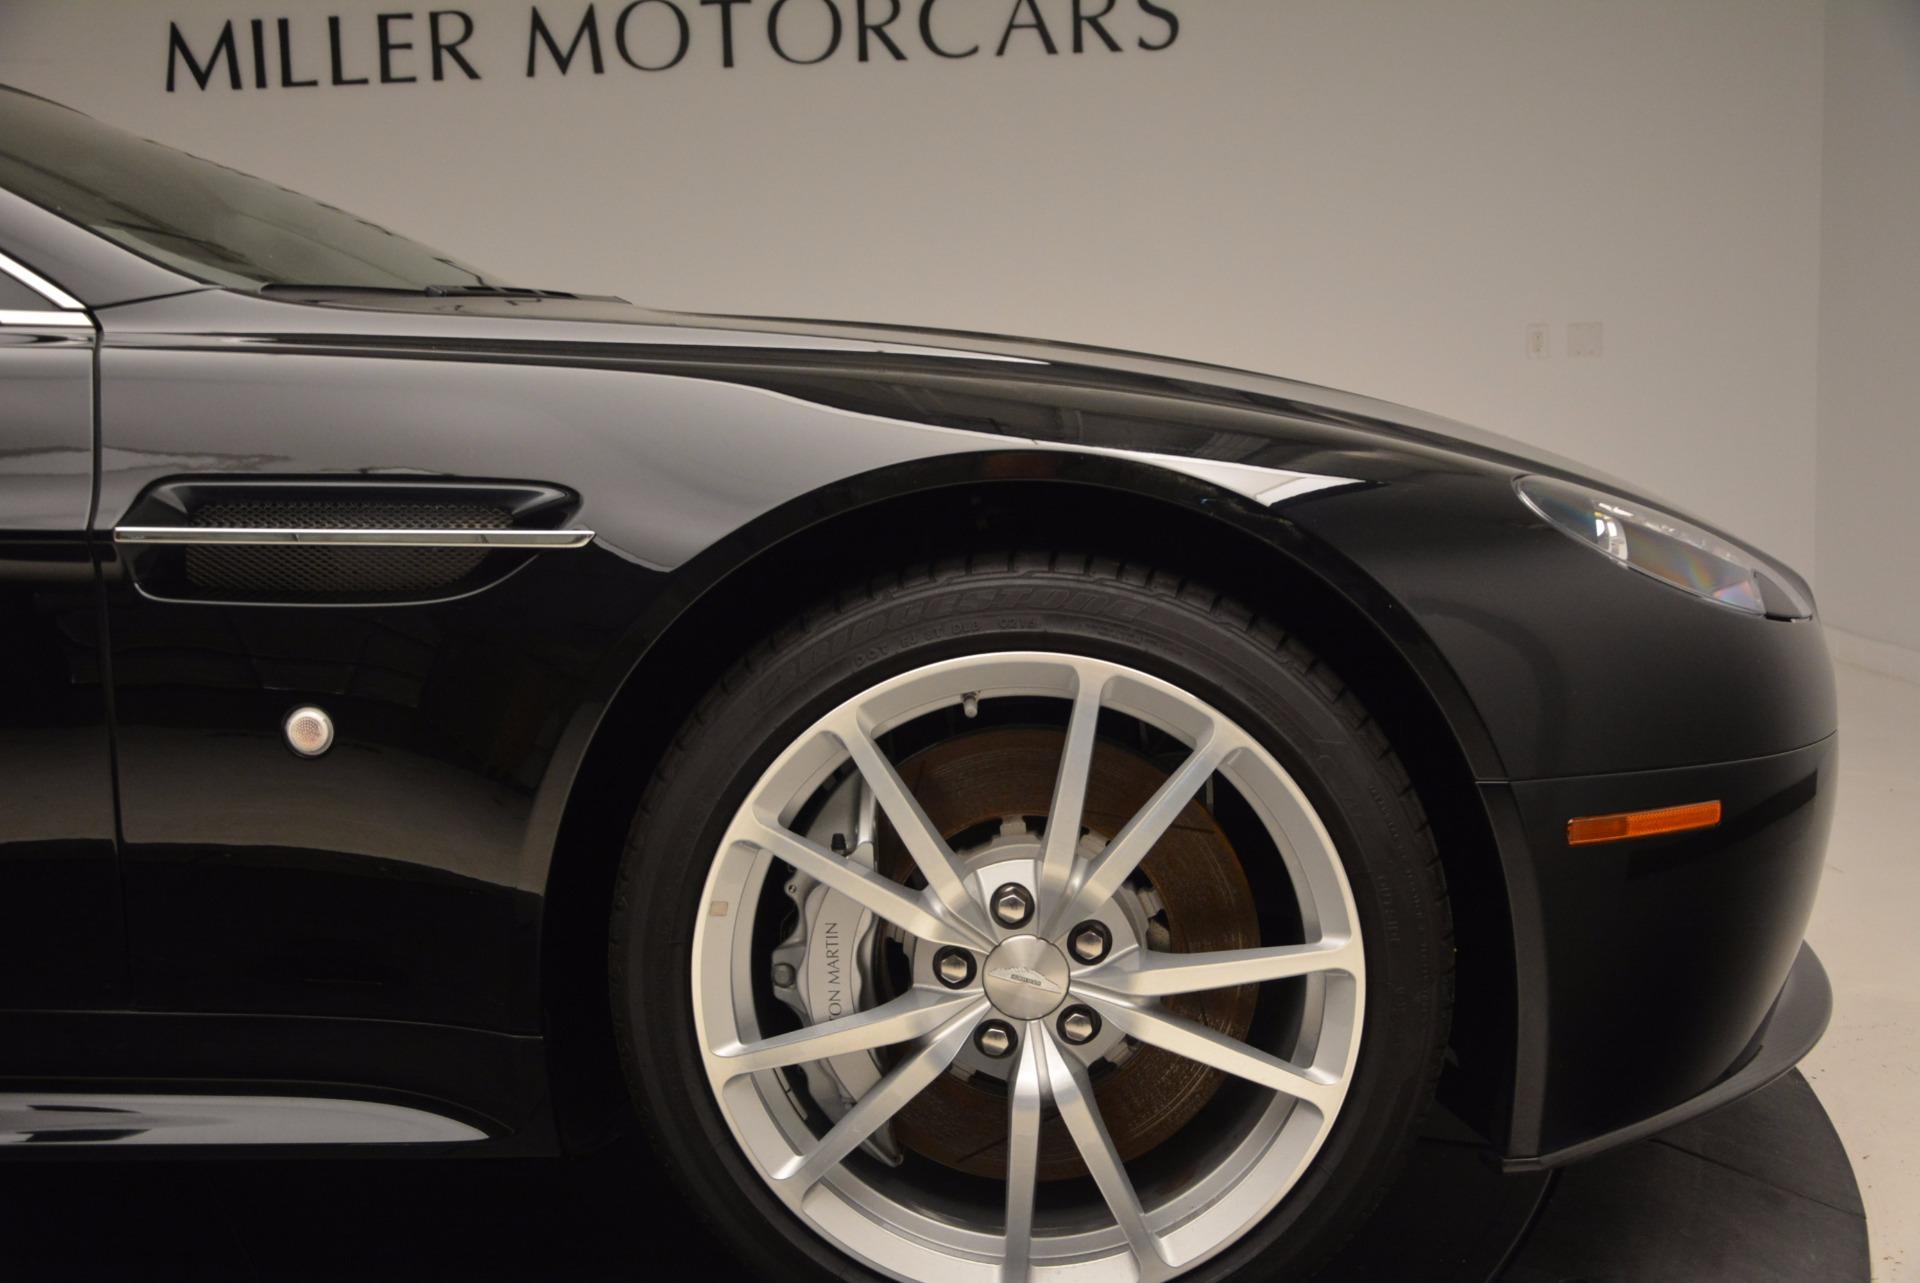 New 2016 Aston Martin V8 Vantage Roadster